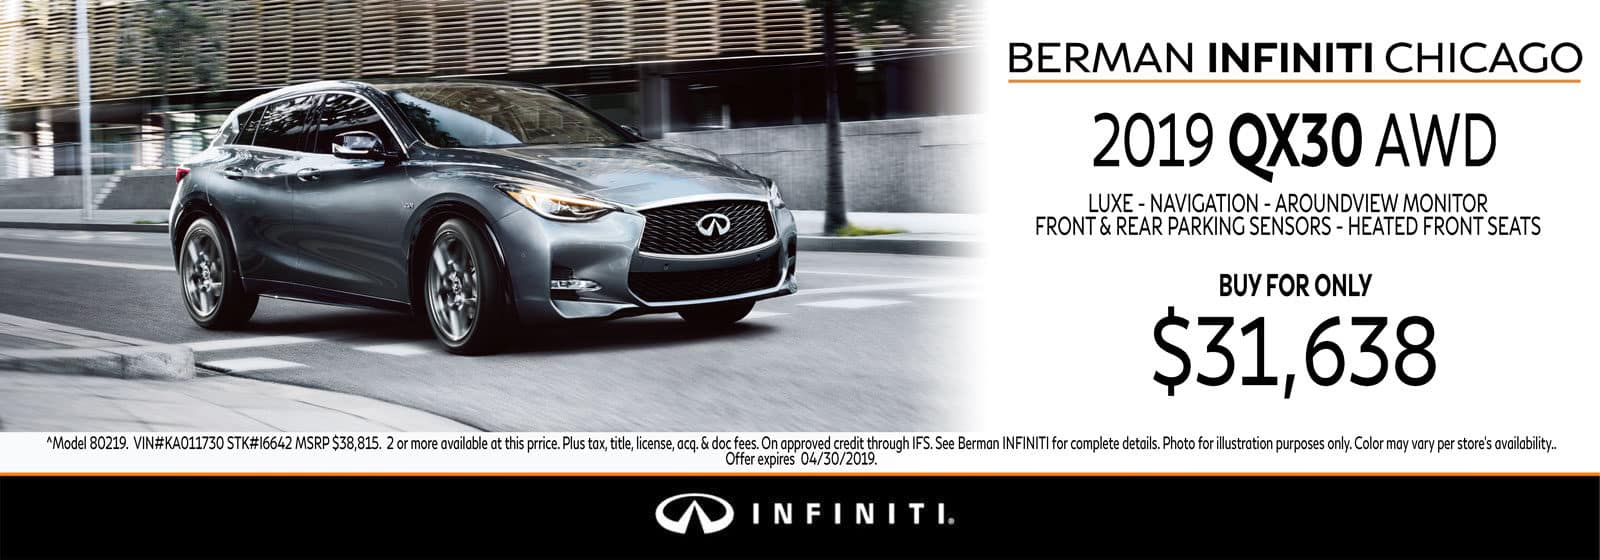 New 2019 INFINITI QX30 April offer at Berman INFINITI Chicago!